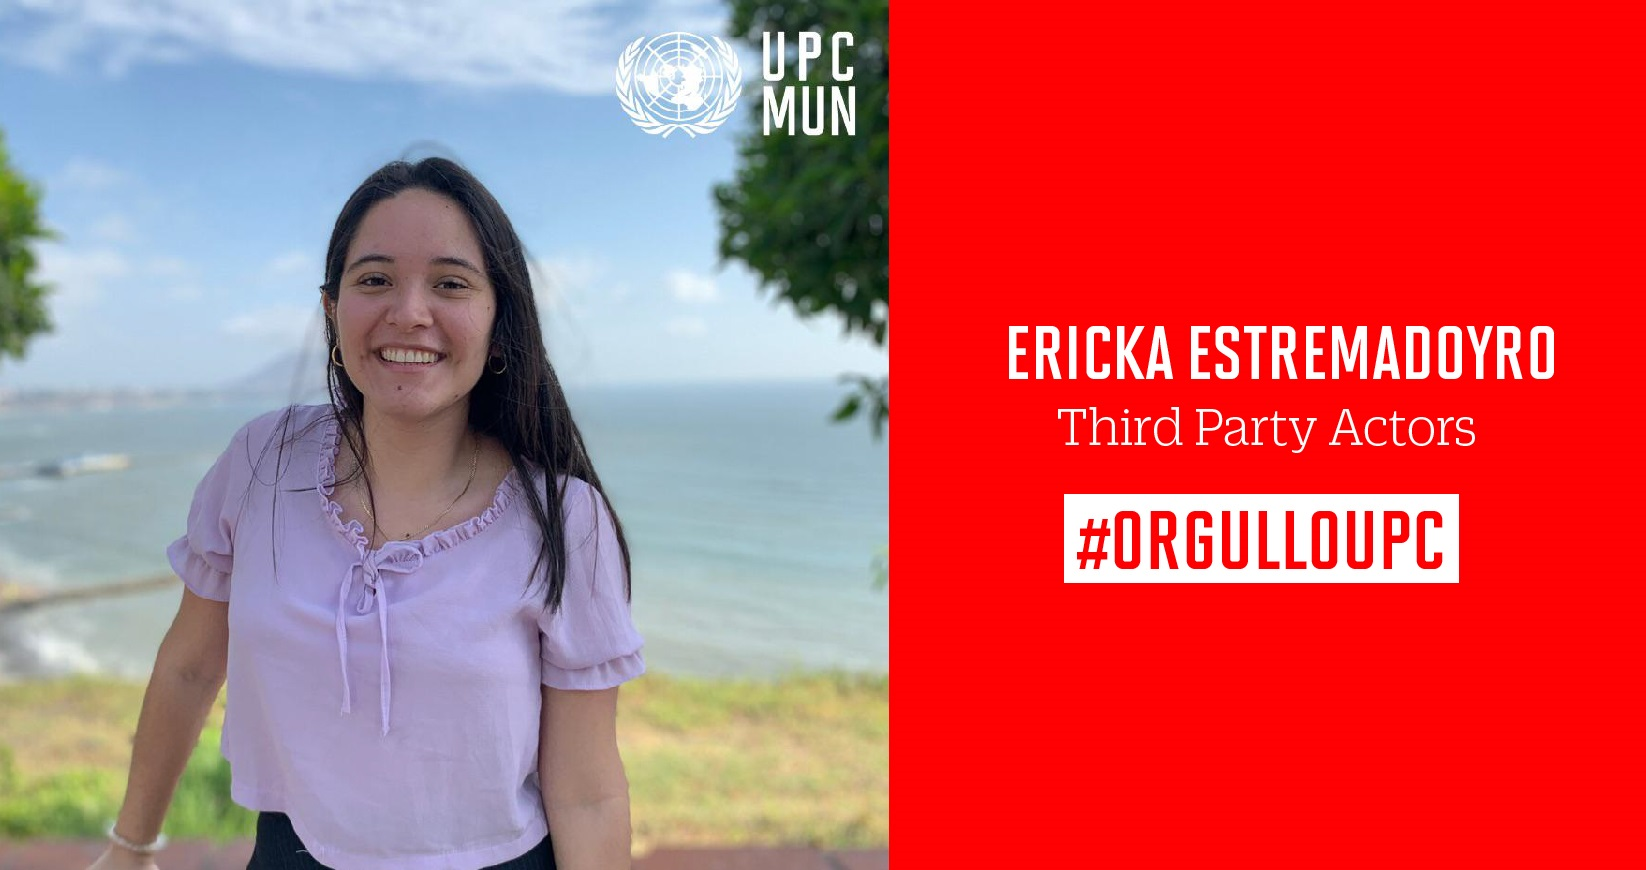 Alumna UPC obtiene 1er puesto en Harvard National Model United Nations LA 2020